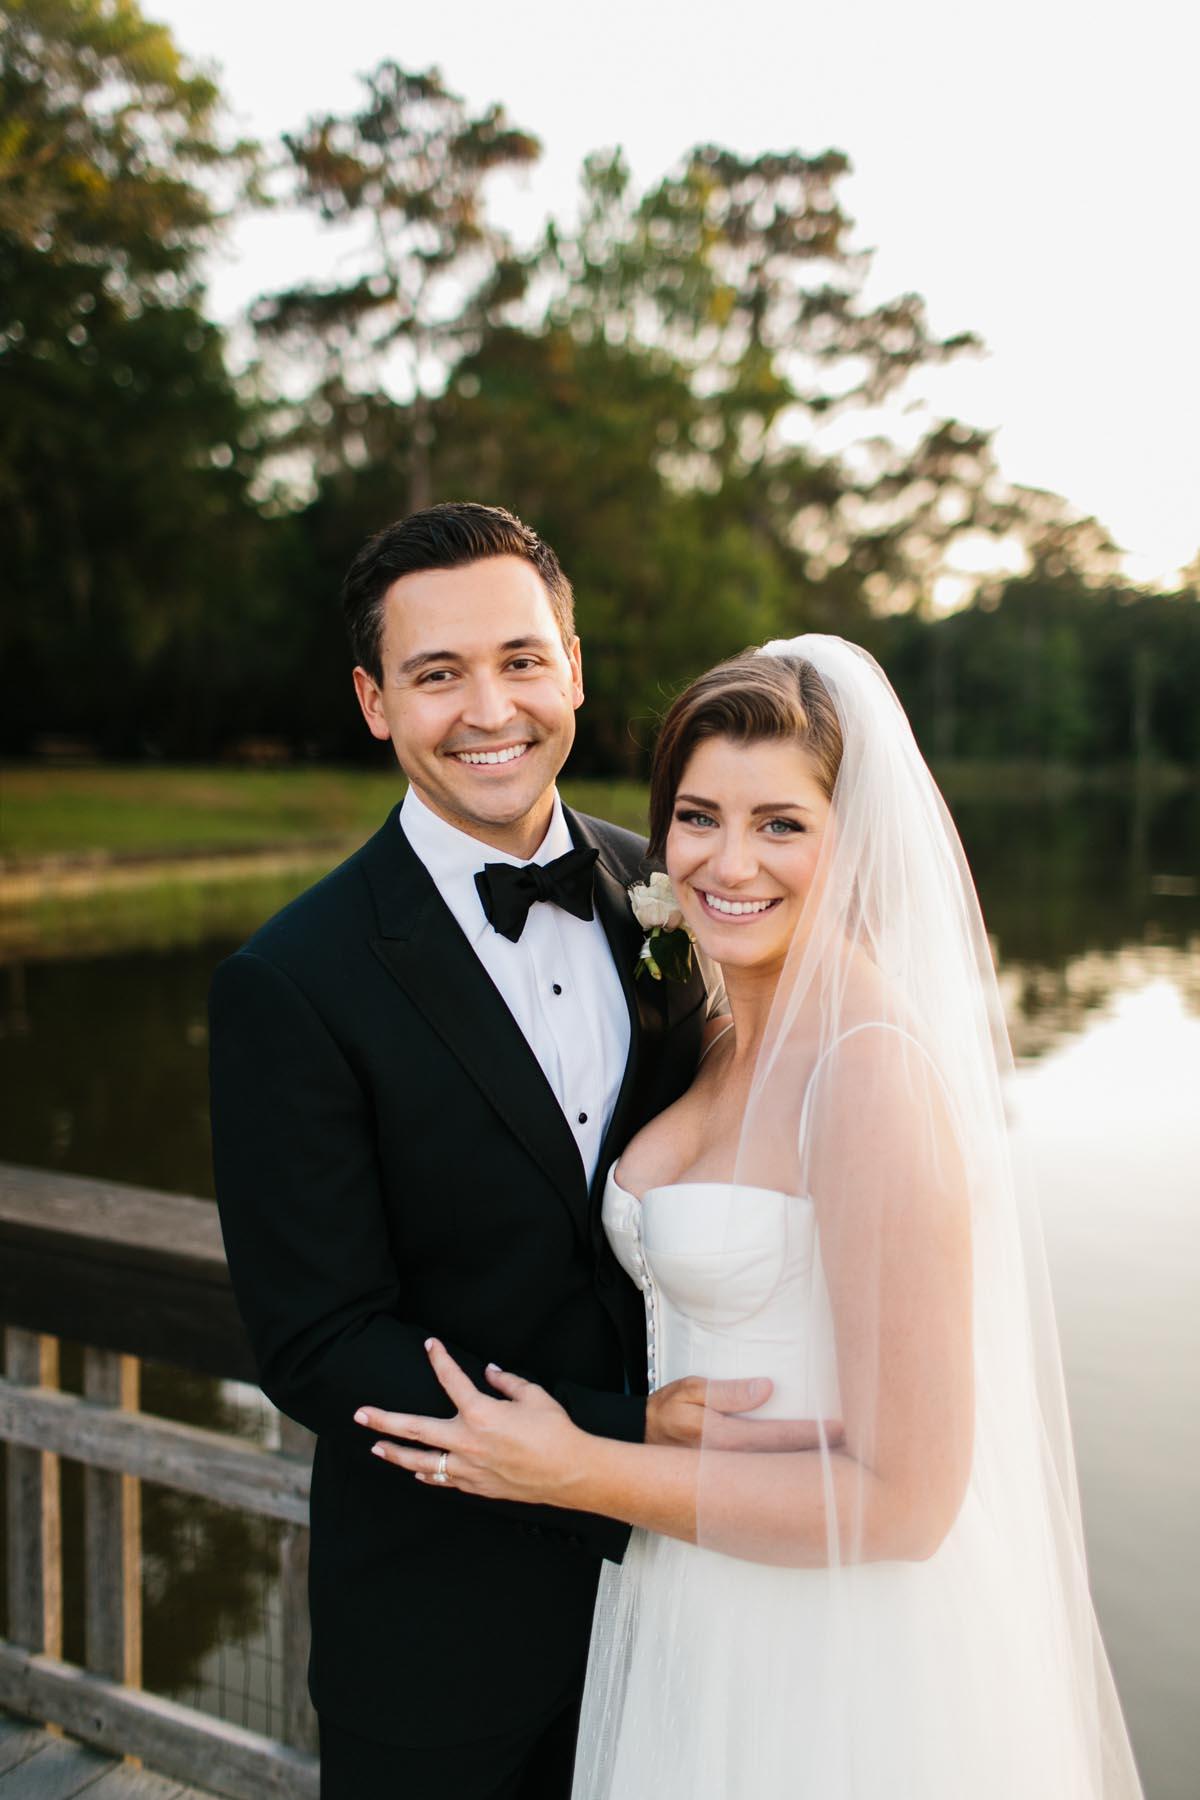 lowry wedding blog eden garden florida wedding-115